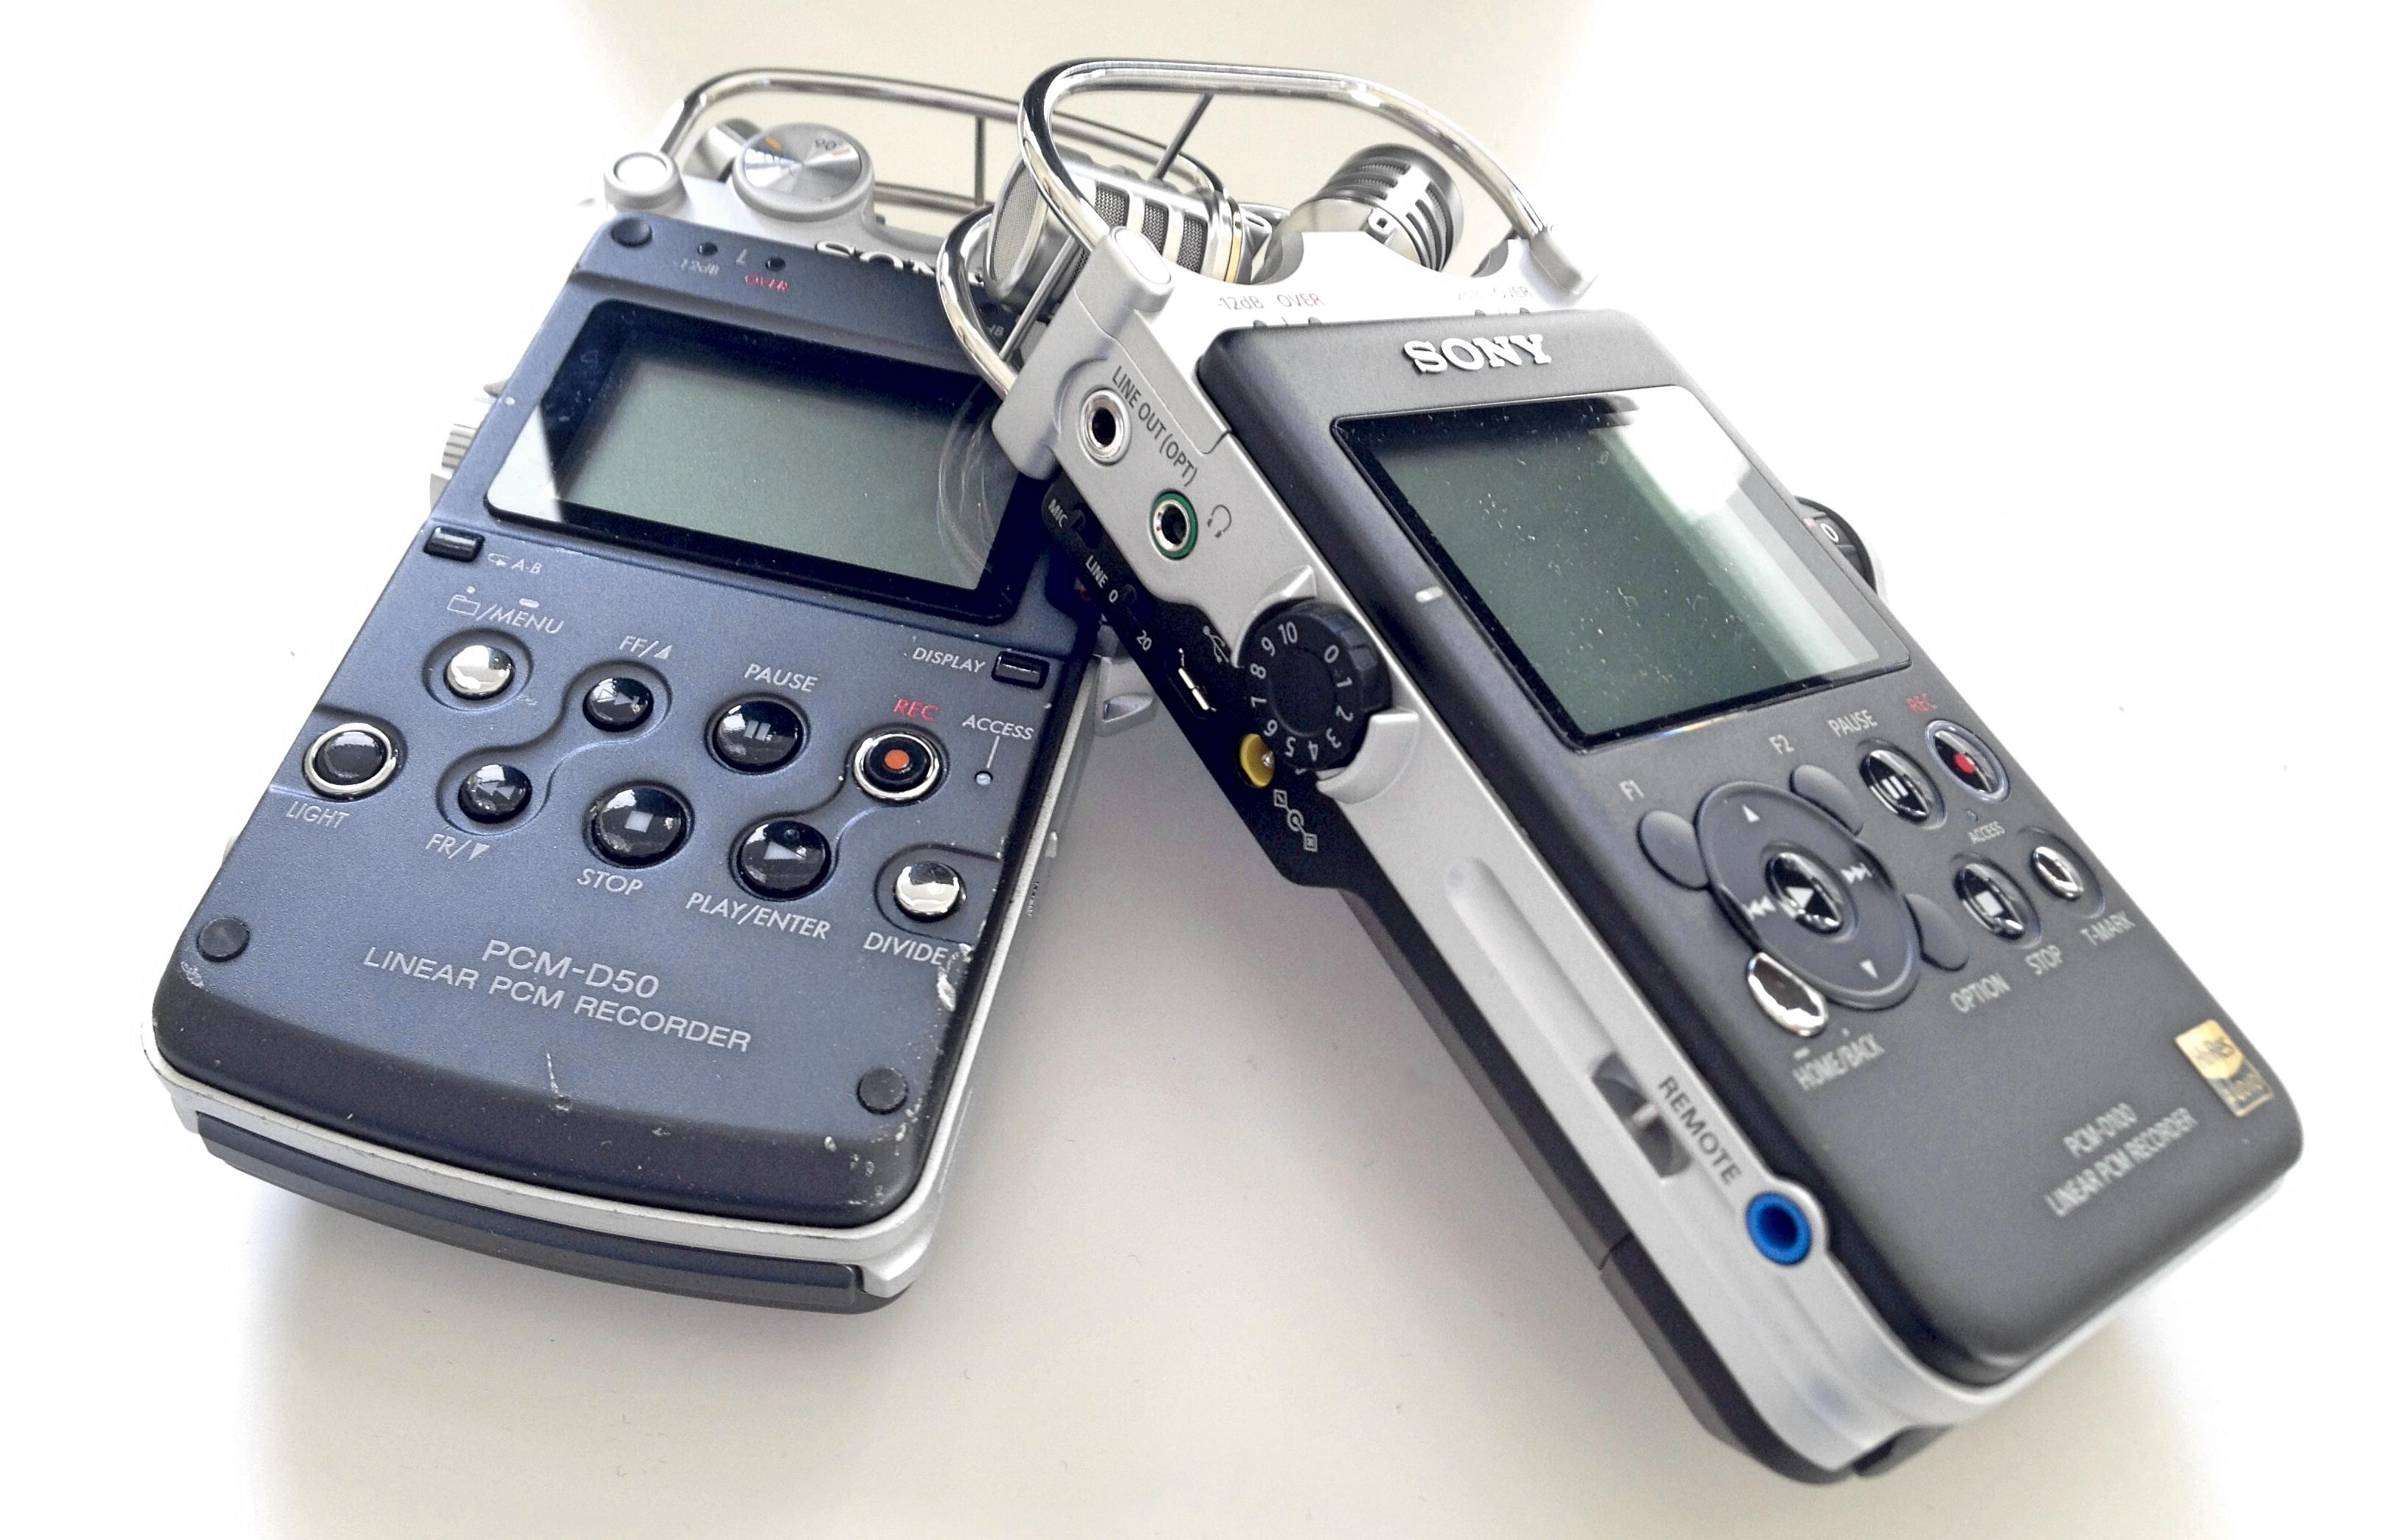 Sony pcm-d50 manual